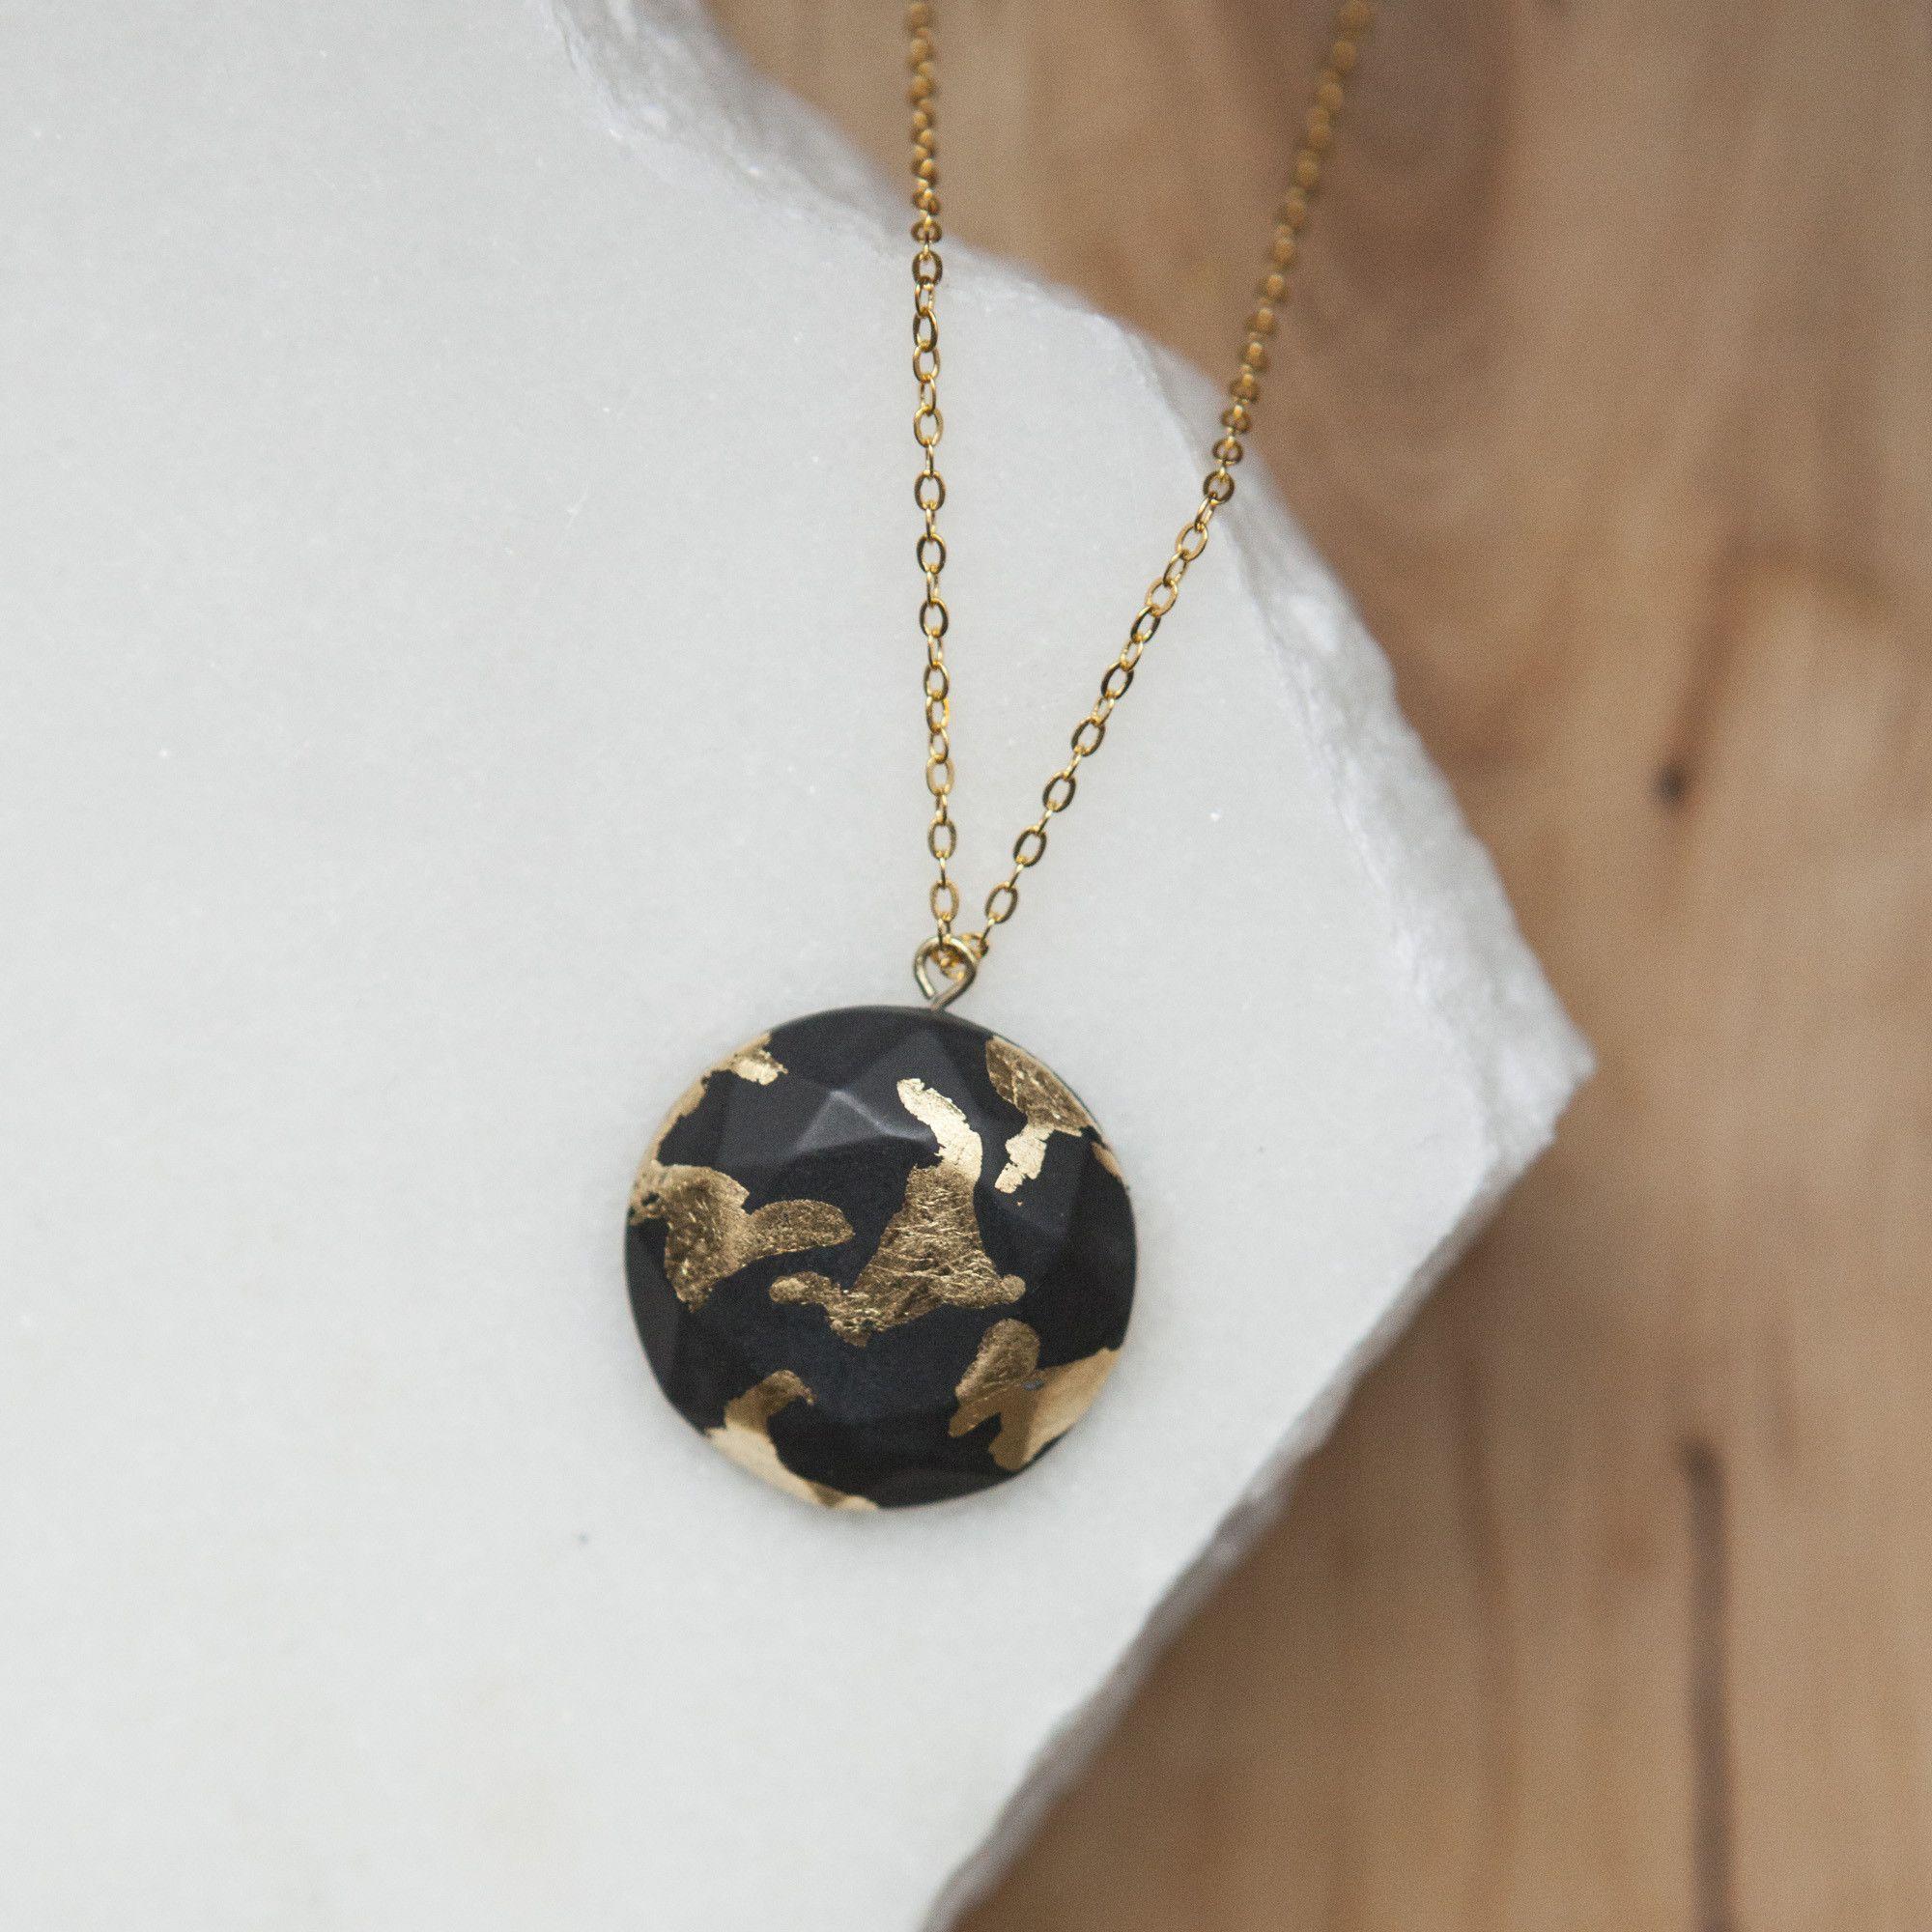 10b4de2eb32bd Concrete Gold Leaf Circle Necklace (Dark) | Products | Circle ...